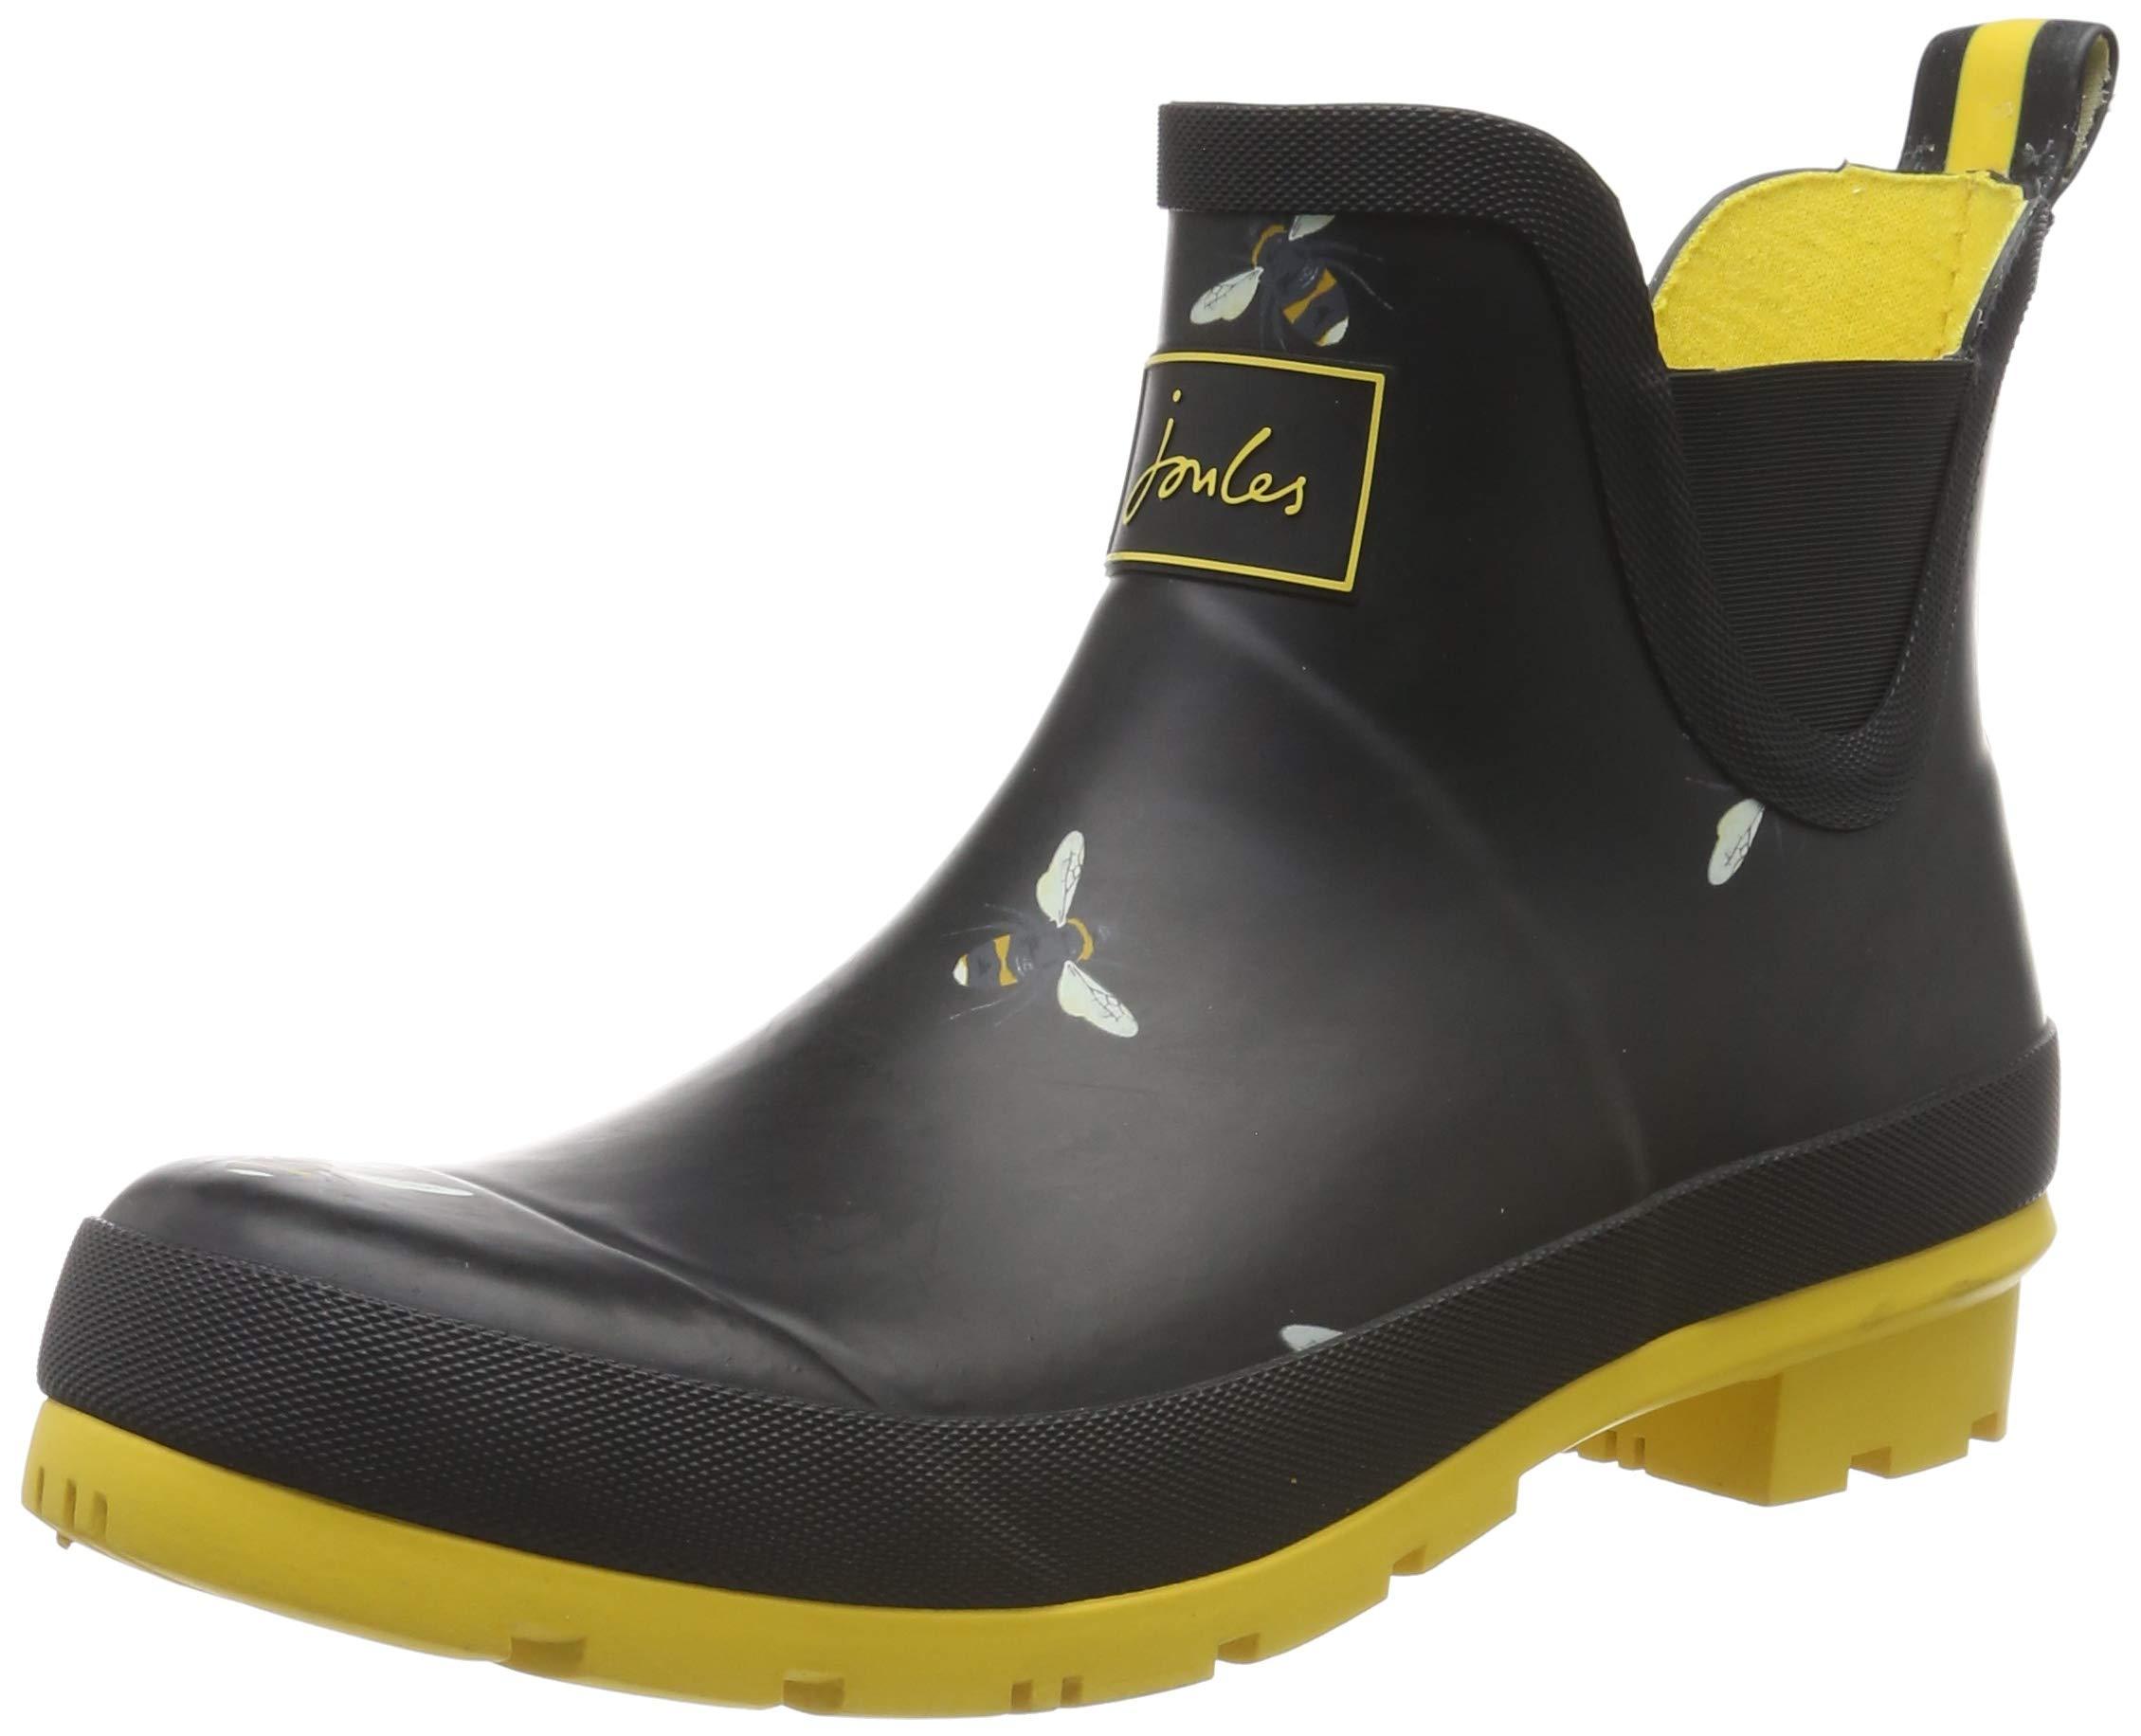 Joules Women's Wellibob Rain Boot (6 M US, Black Botanical Bees)